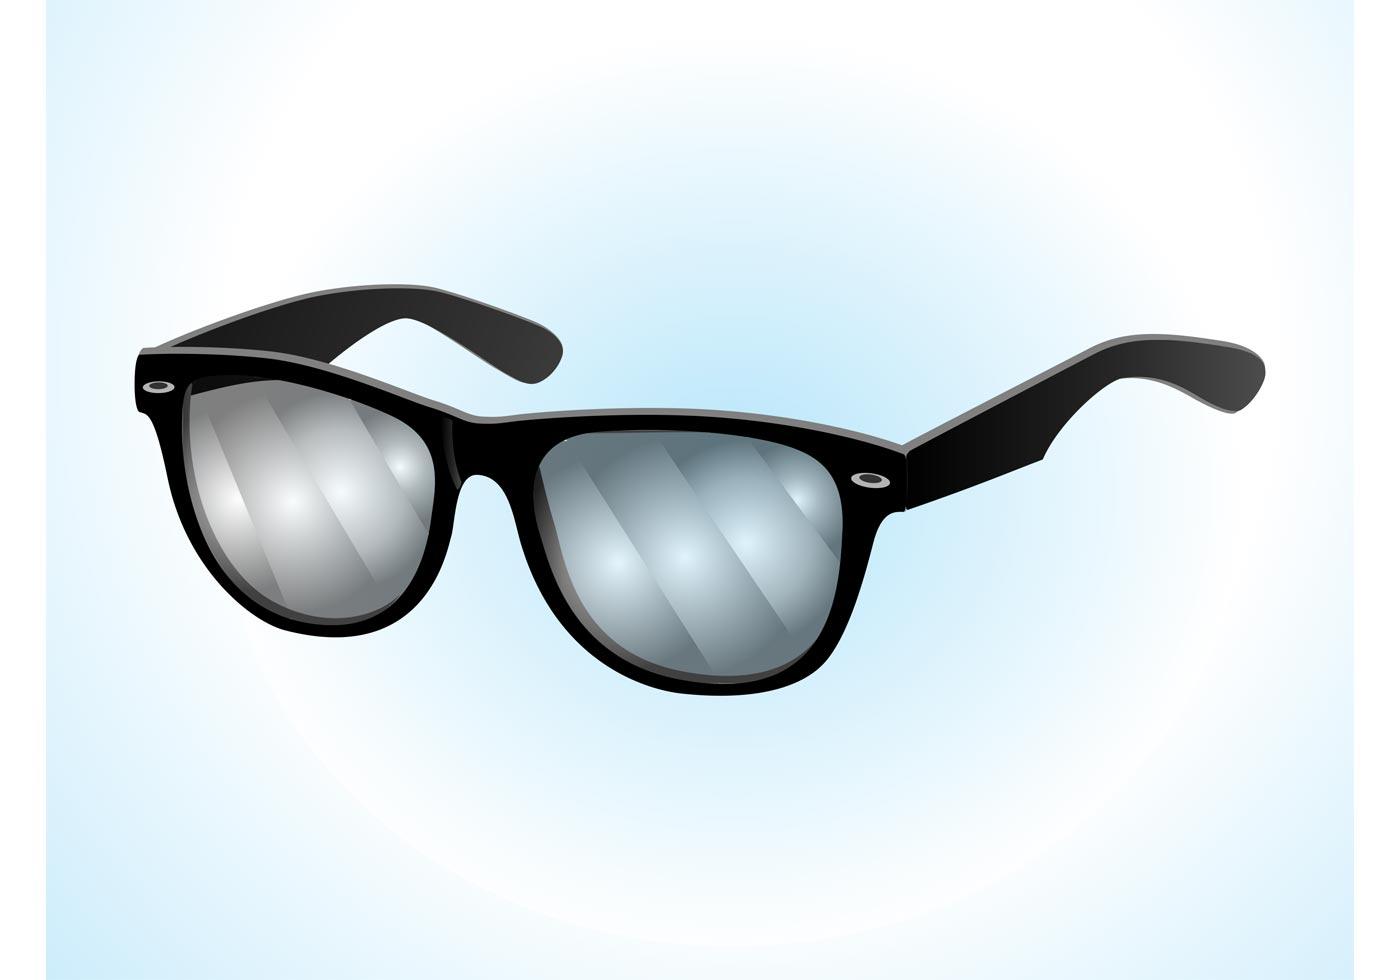 Ray-Ban Sunglasses - Download Free Vector Art, Stock ...